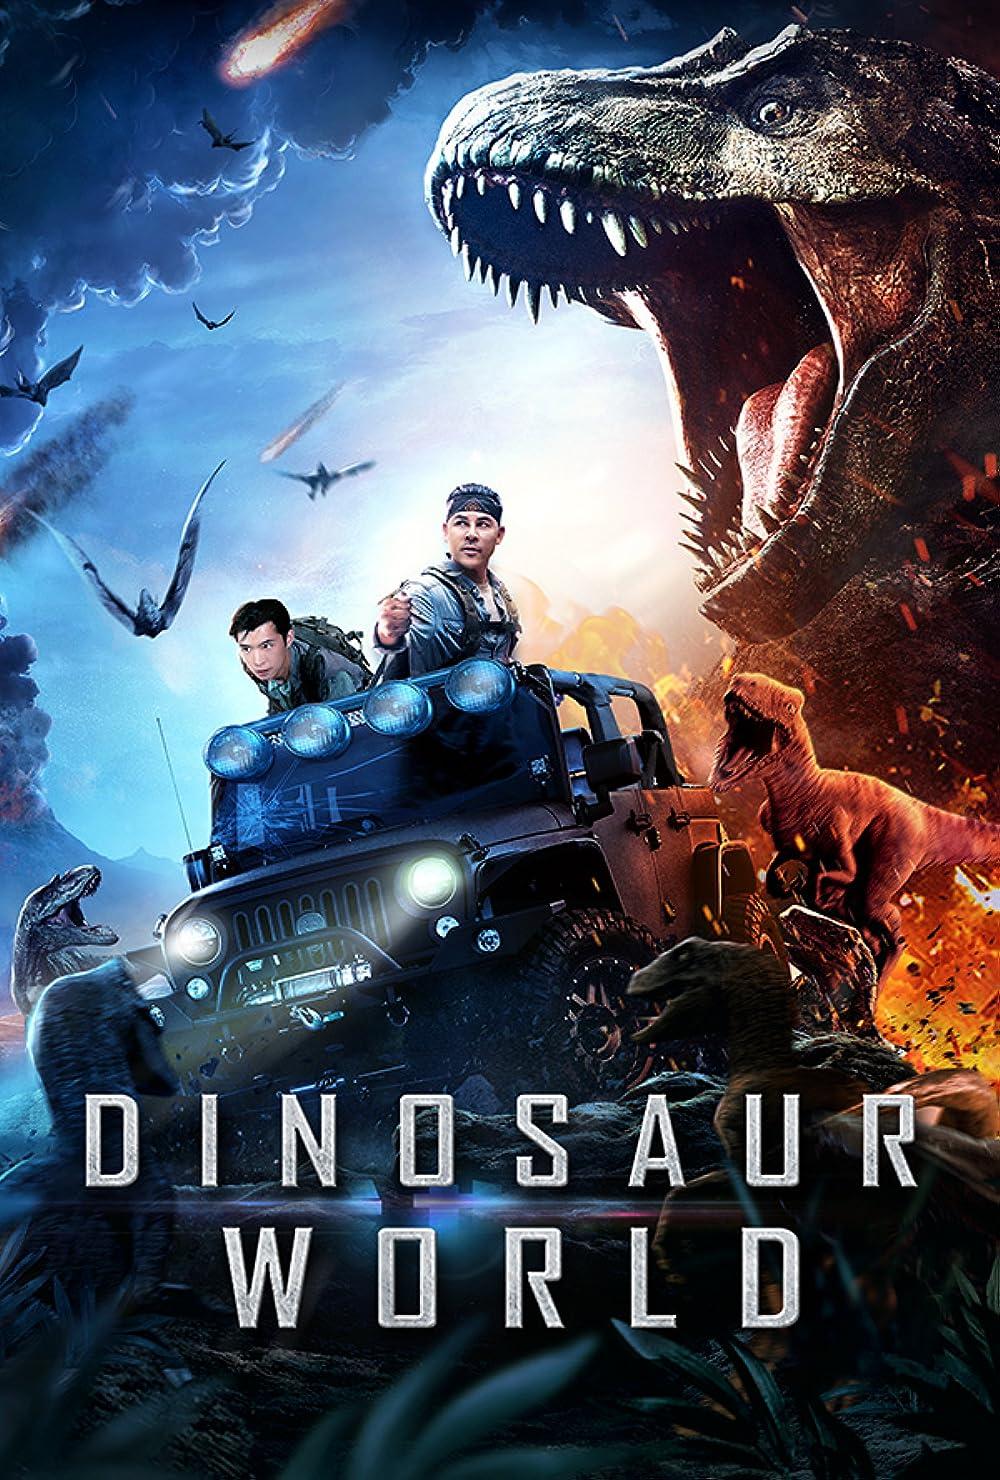 Dinosaur World (2020) Dua Audio  480p   720p HDRip [Hindi – Chinese] 250MB   950MB  Download